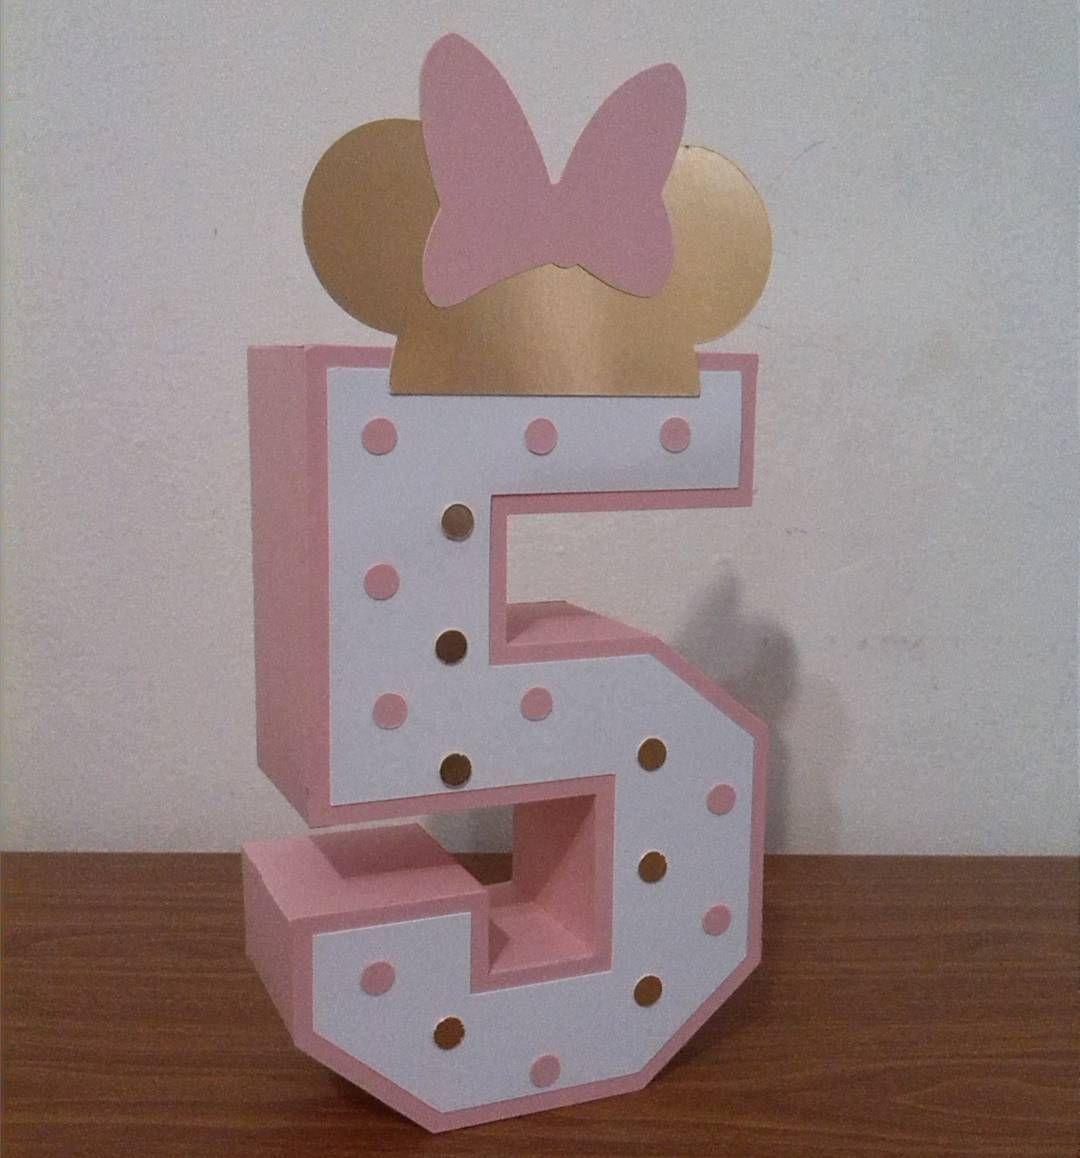 Número 5 3d Elaborado En Cartulina Con Motivo De Minnie Gold Letras3d Numeros3d Minniegold Christmas Cards Mini Mouse Cards